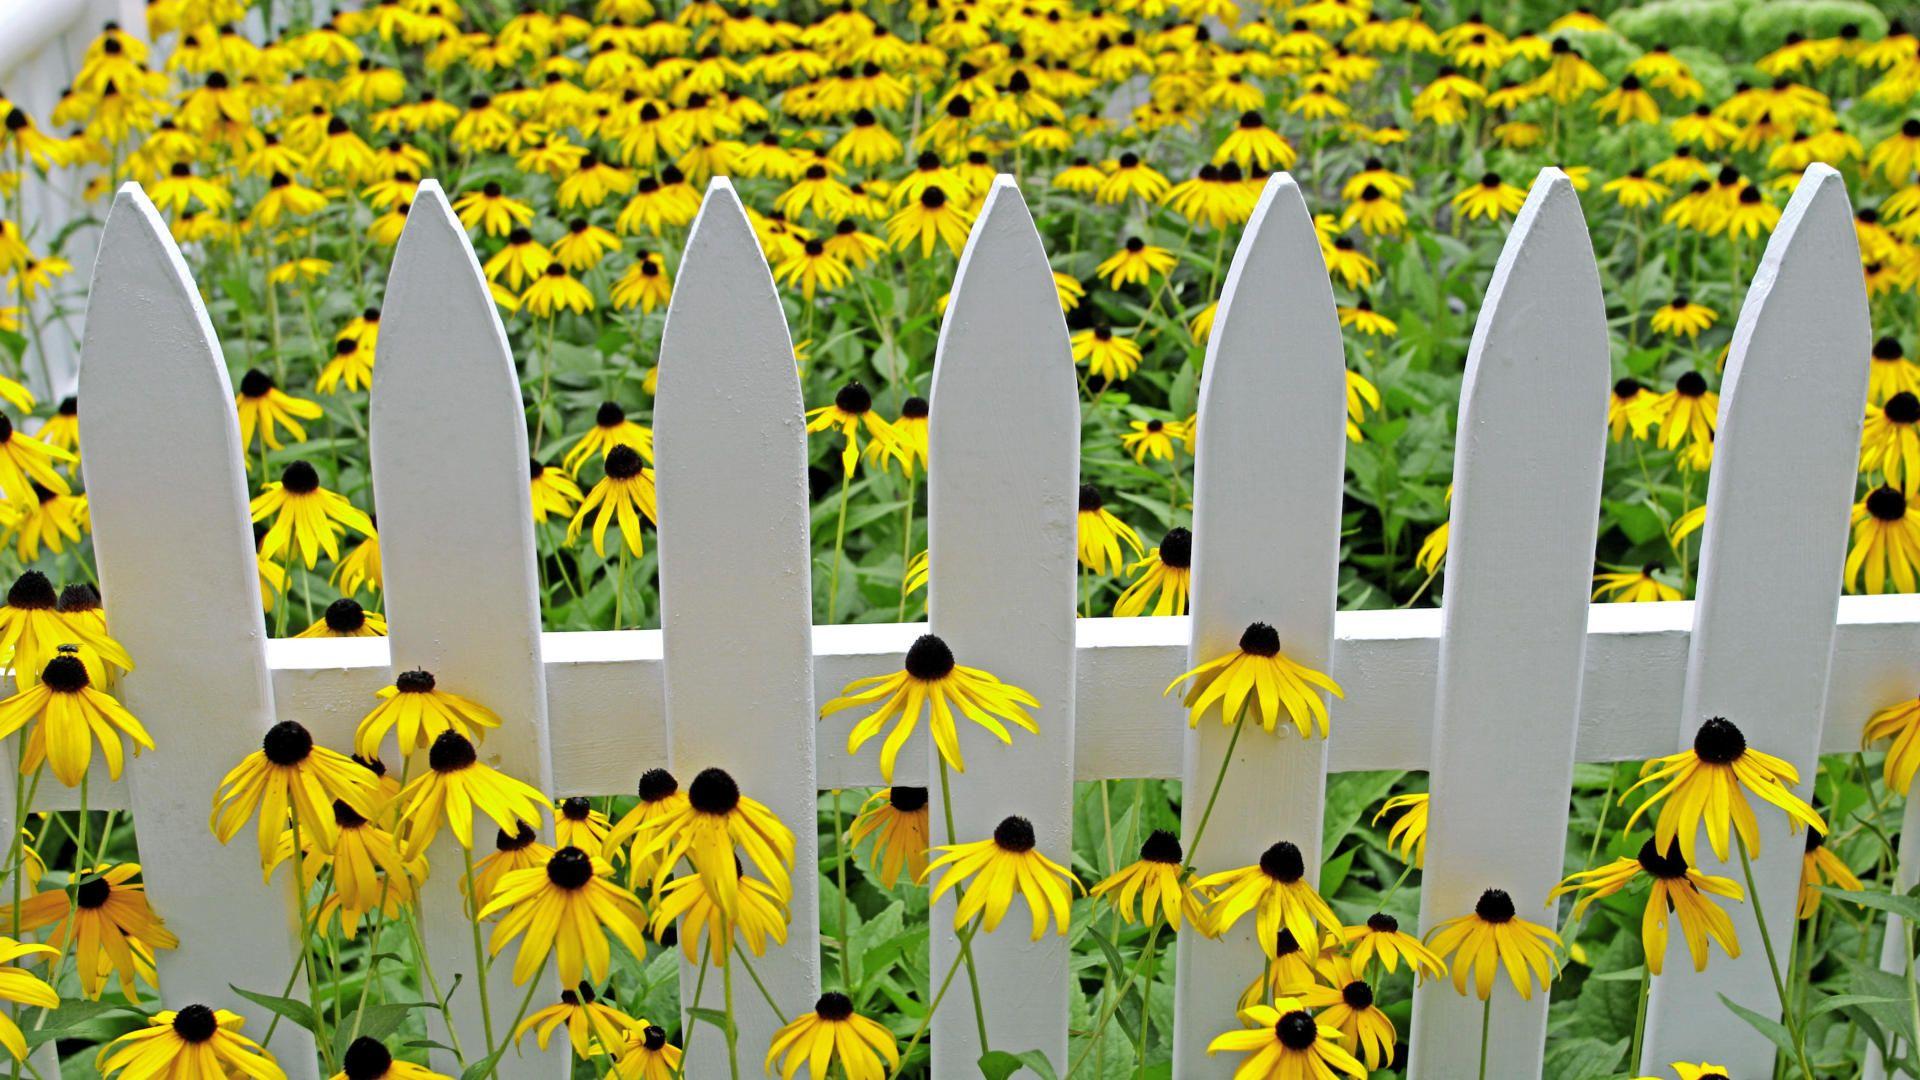 Love Black Eyed Susans White Picket Fences Too